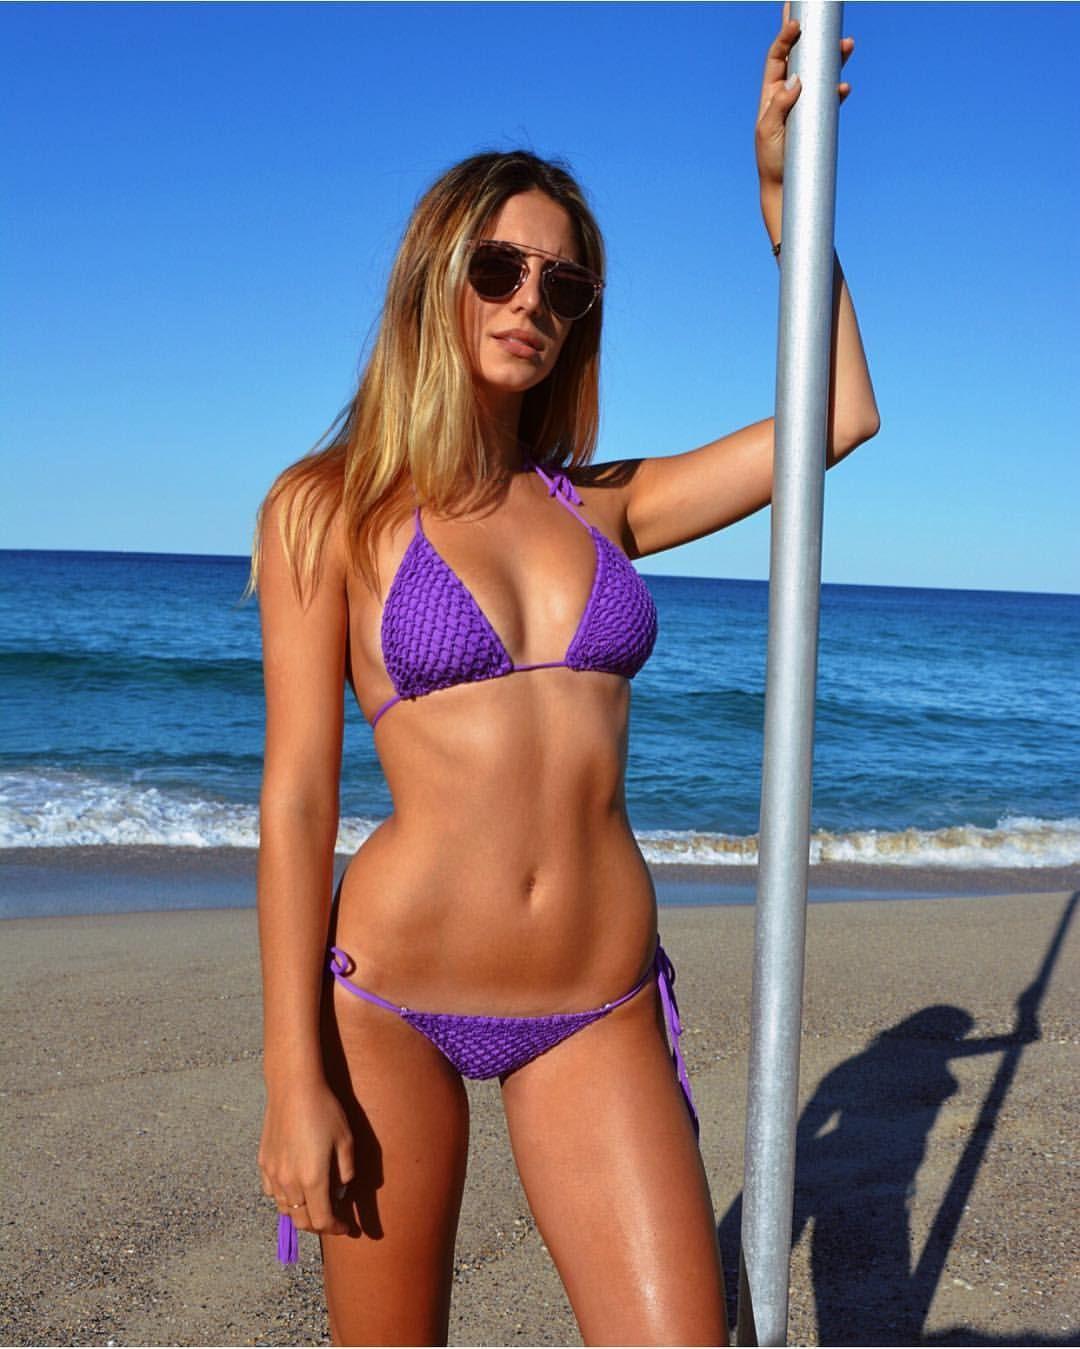 Cleavage Sarah Kohan nude (64 photos), Pussy, Cleavage, Feet, underwear 2019